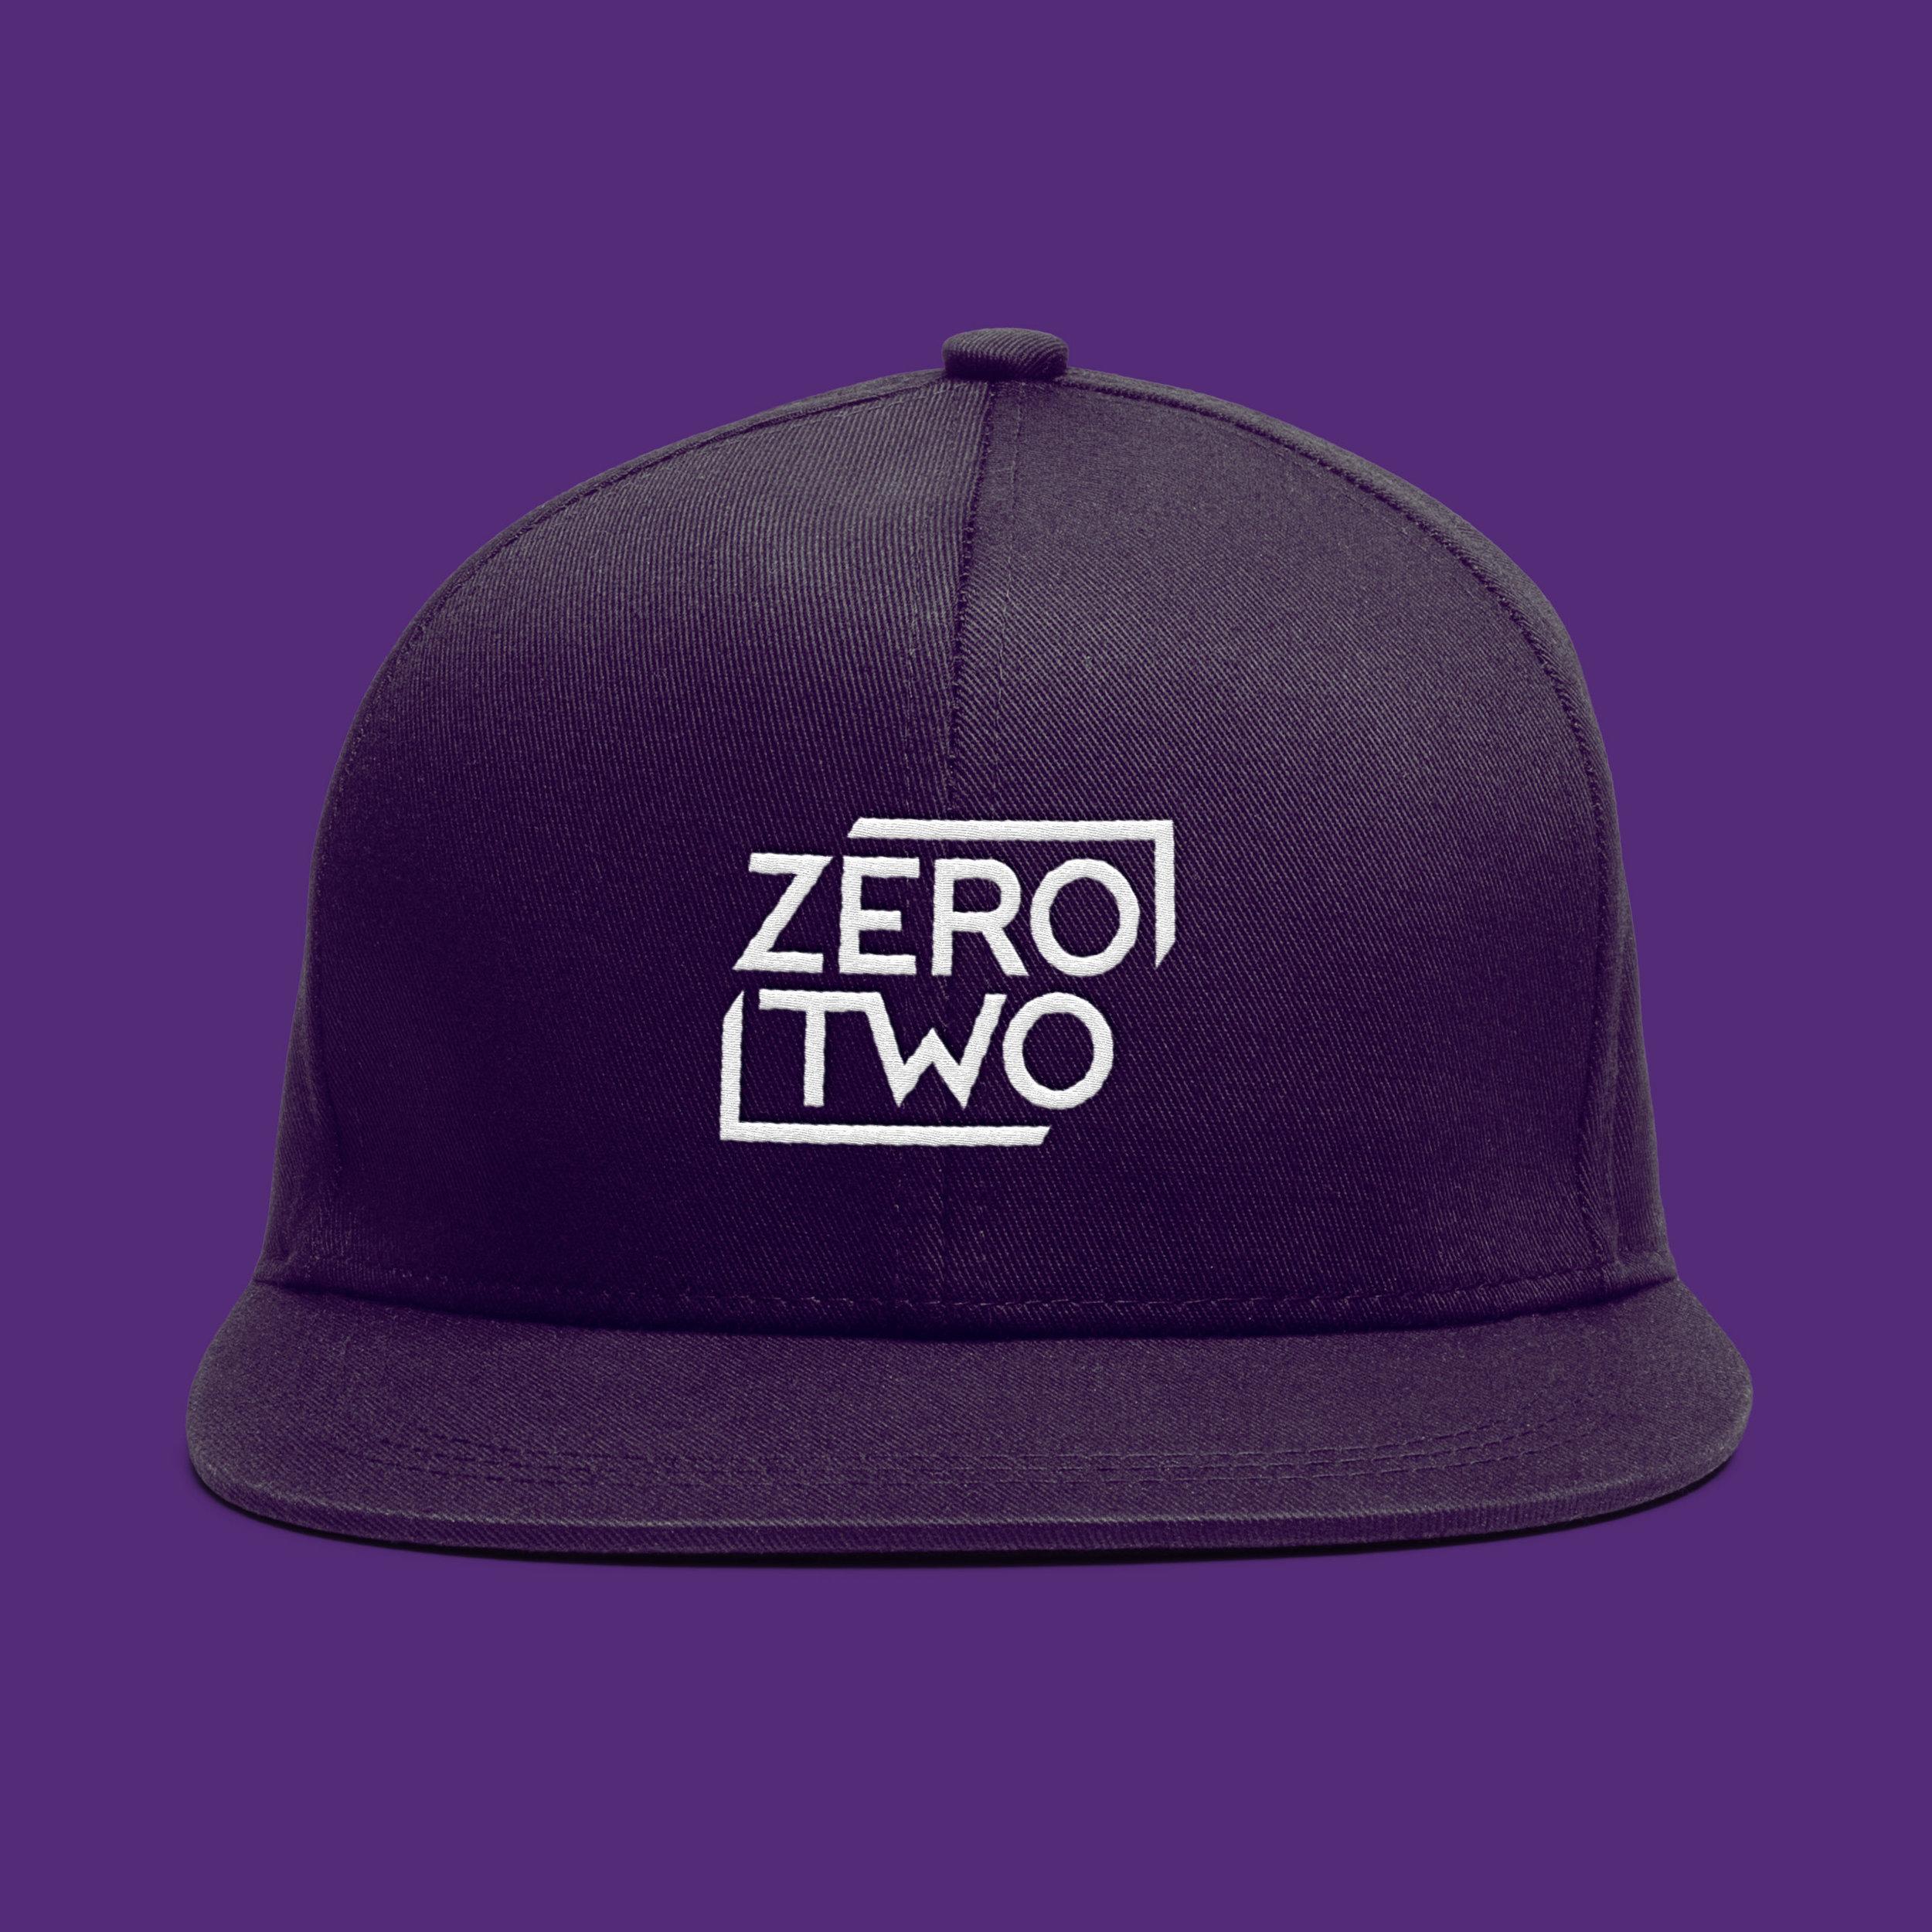 custom hat design, logo mockup asheville, professional brand designer